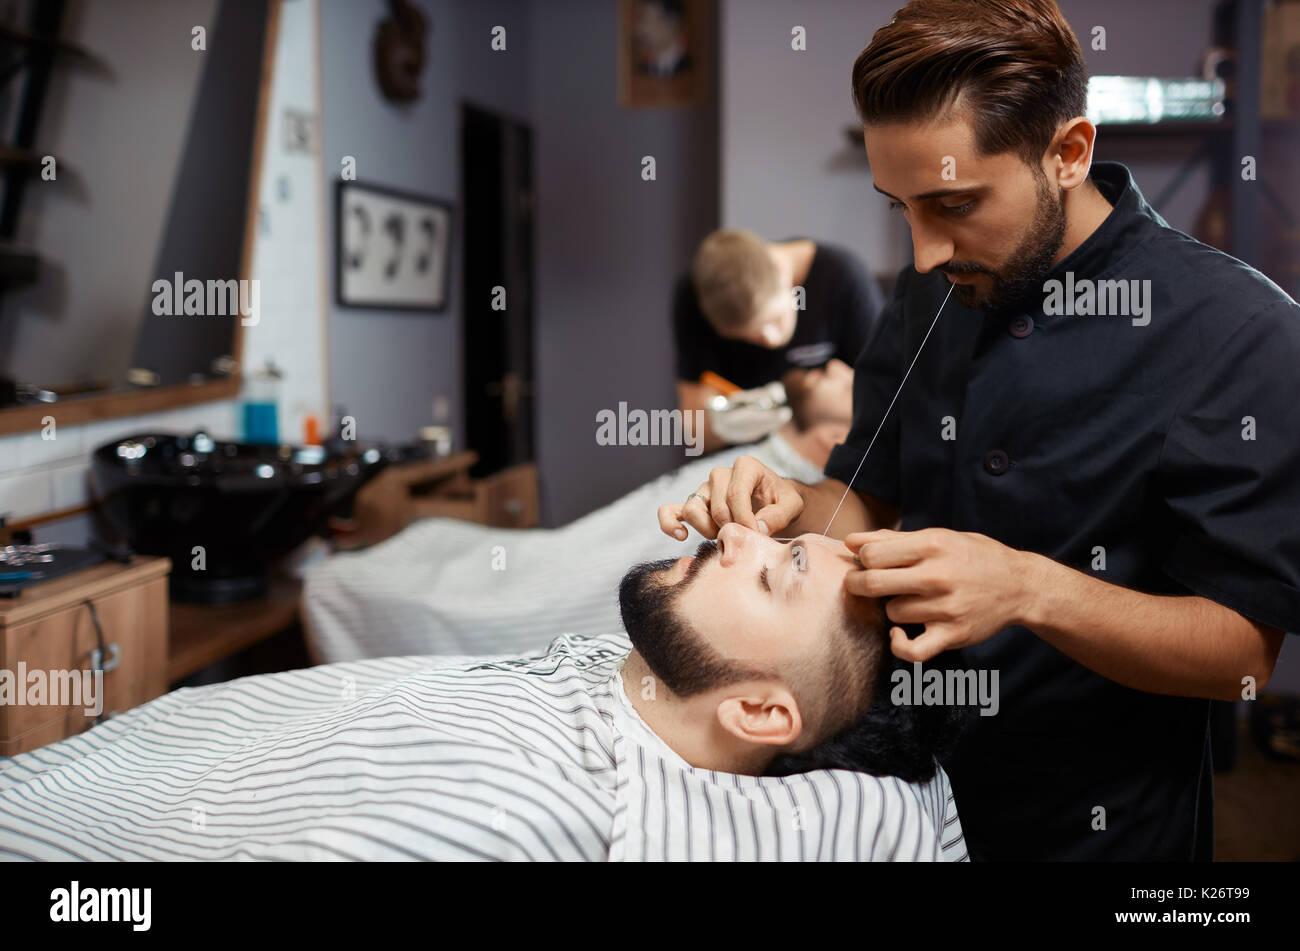 Brunet man visiting barbershop for  cutting beard of thread. - Stock Image